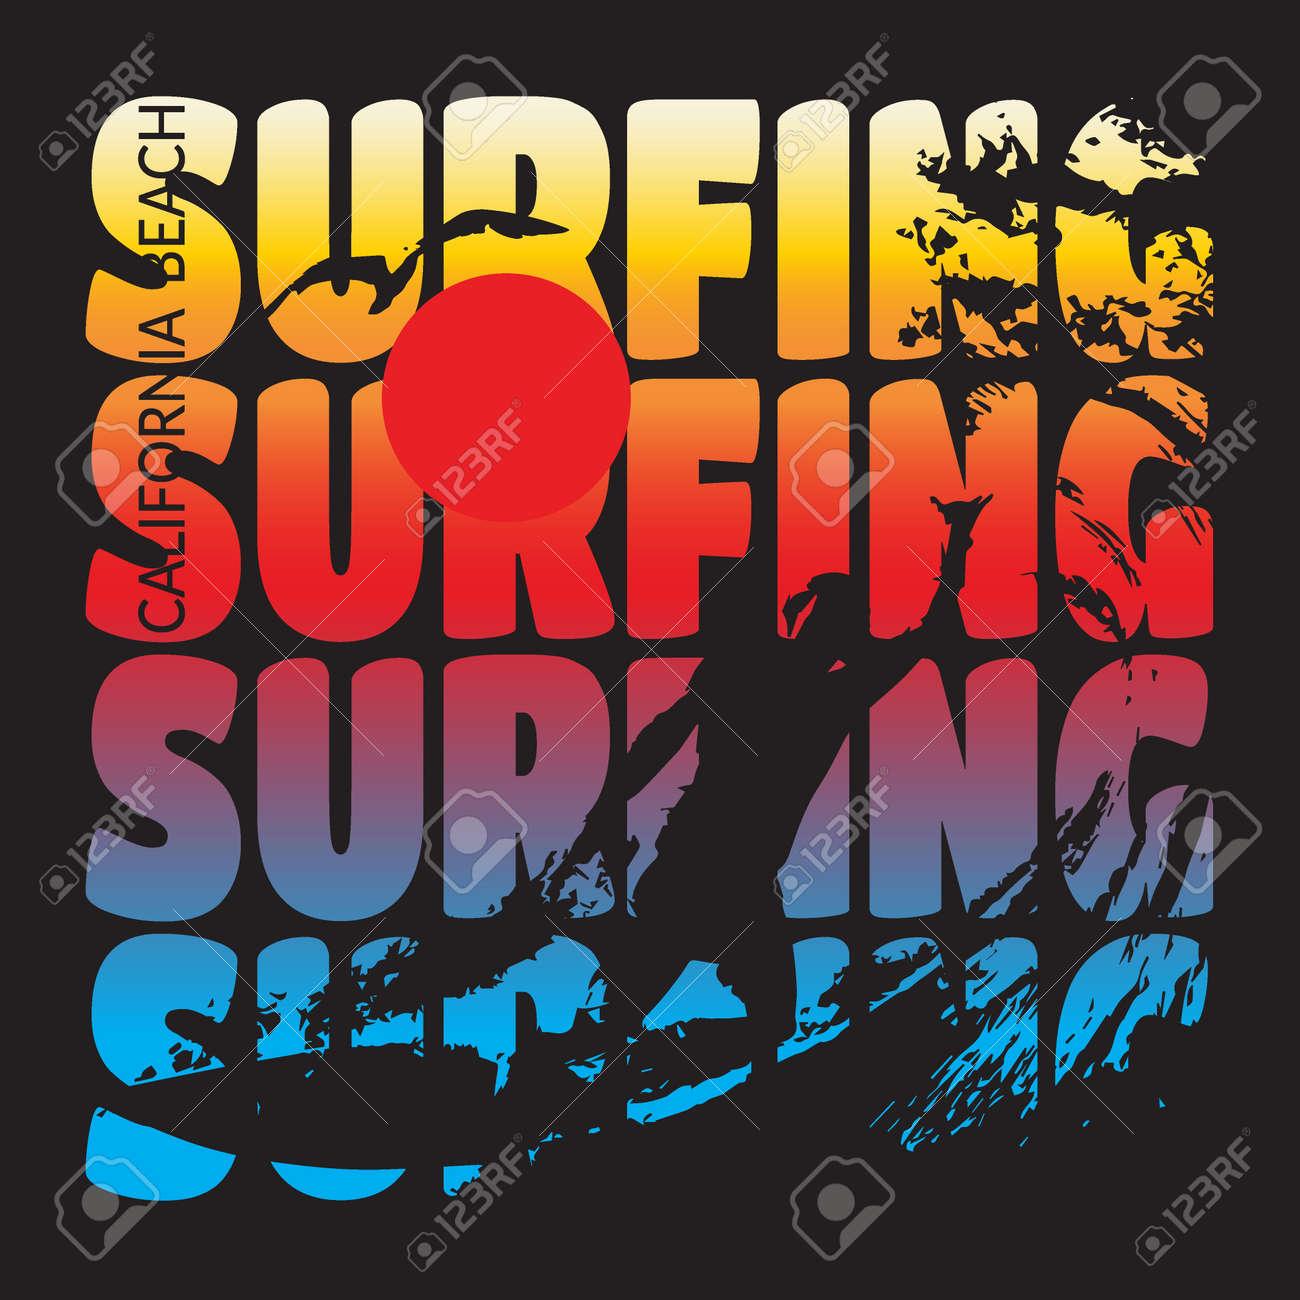 California Beach Typography Graphics T Shirt Printing Design For Sportswear Apparel CA Original